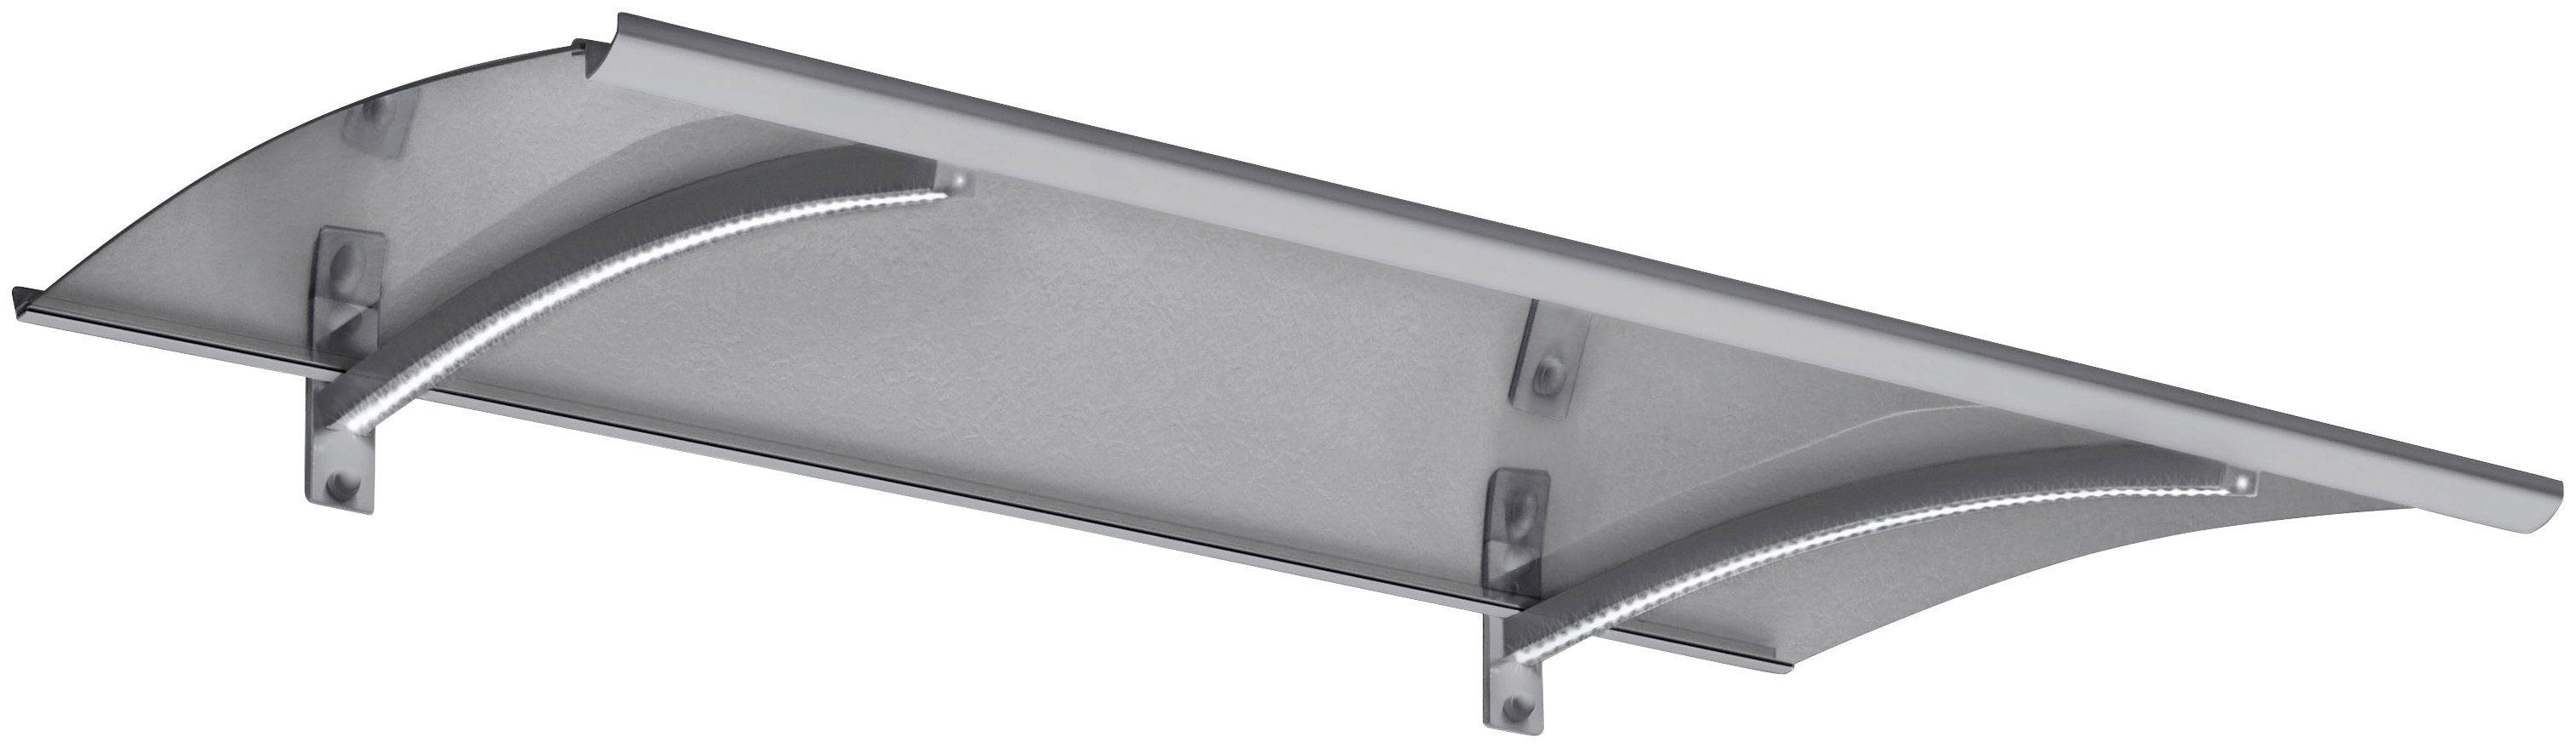 Bogenvordach »LED-Technik«, 150x90x25 cm, silberfarben-transparent